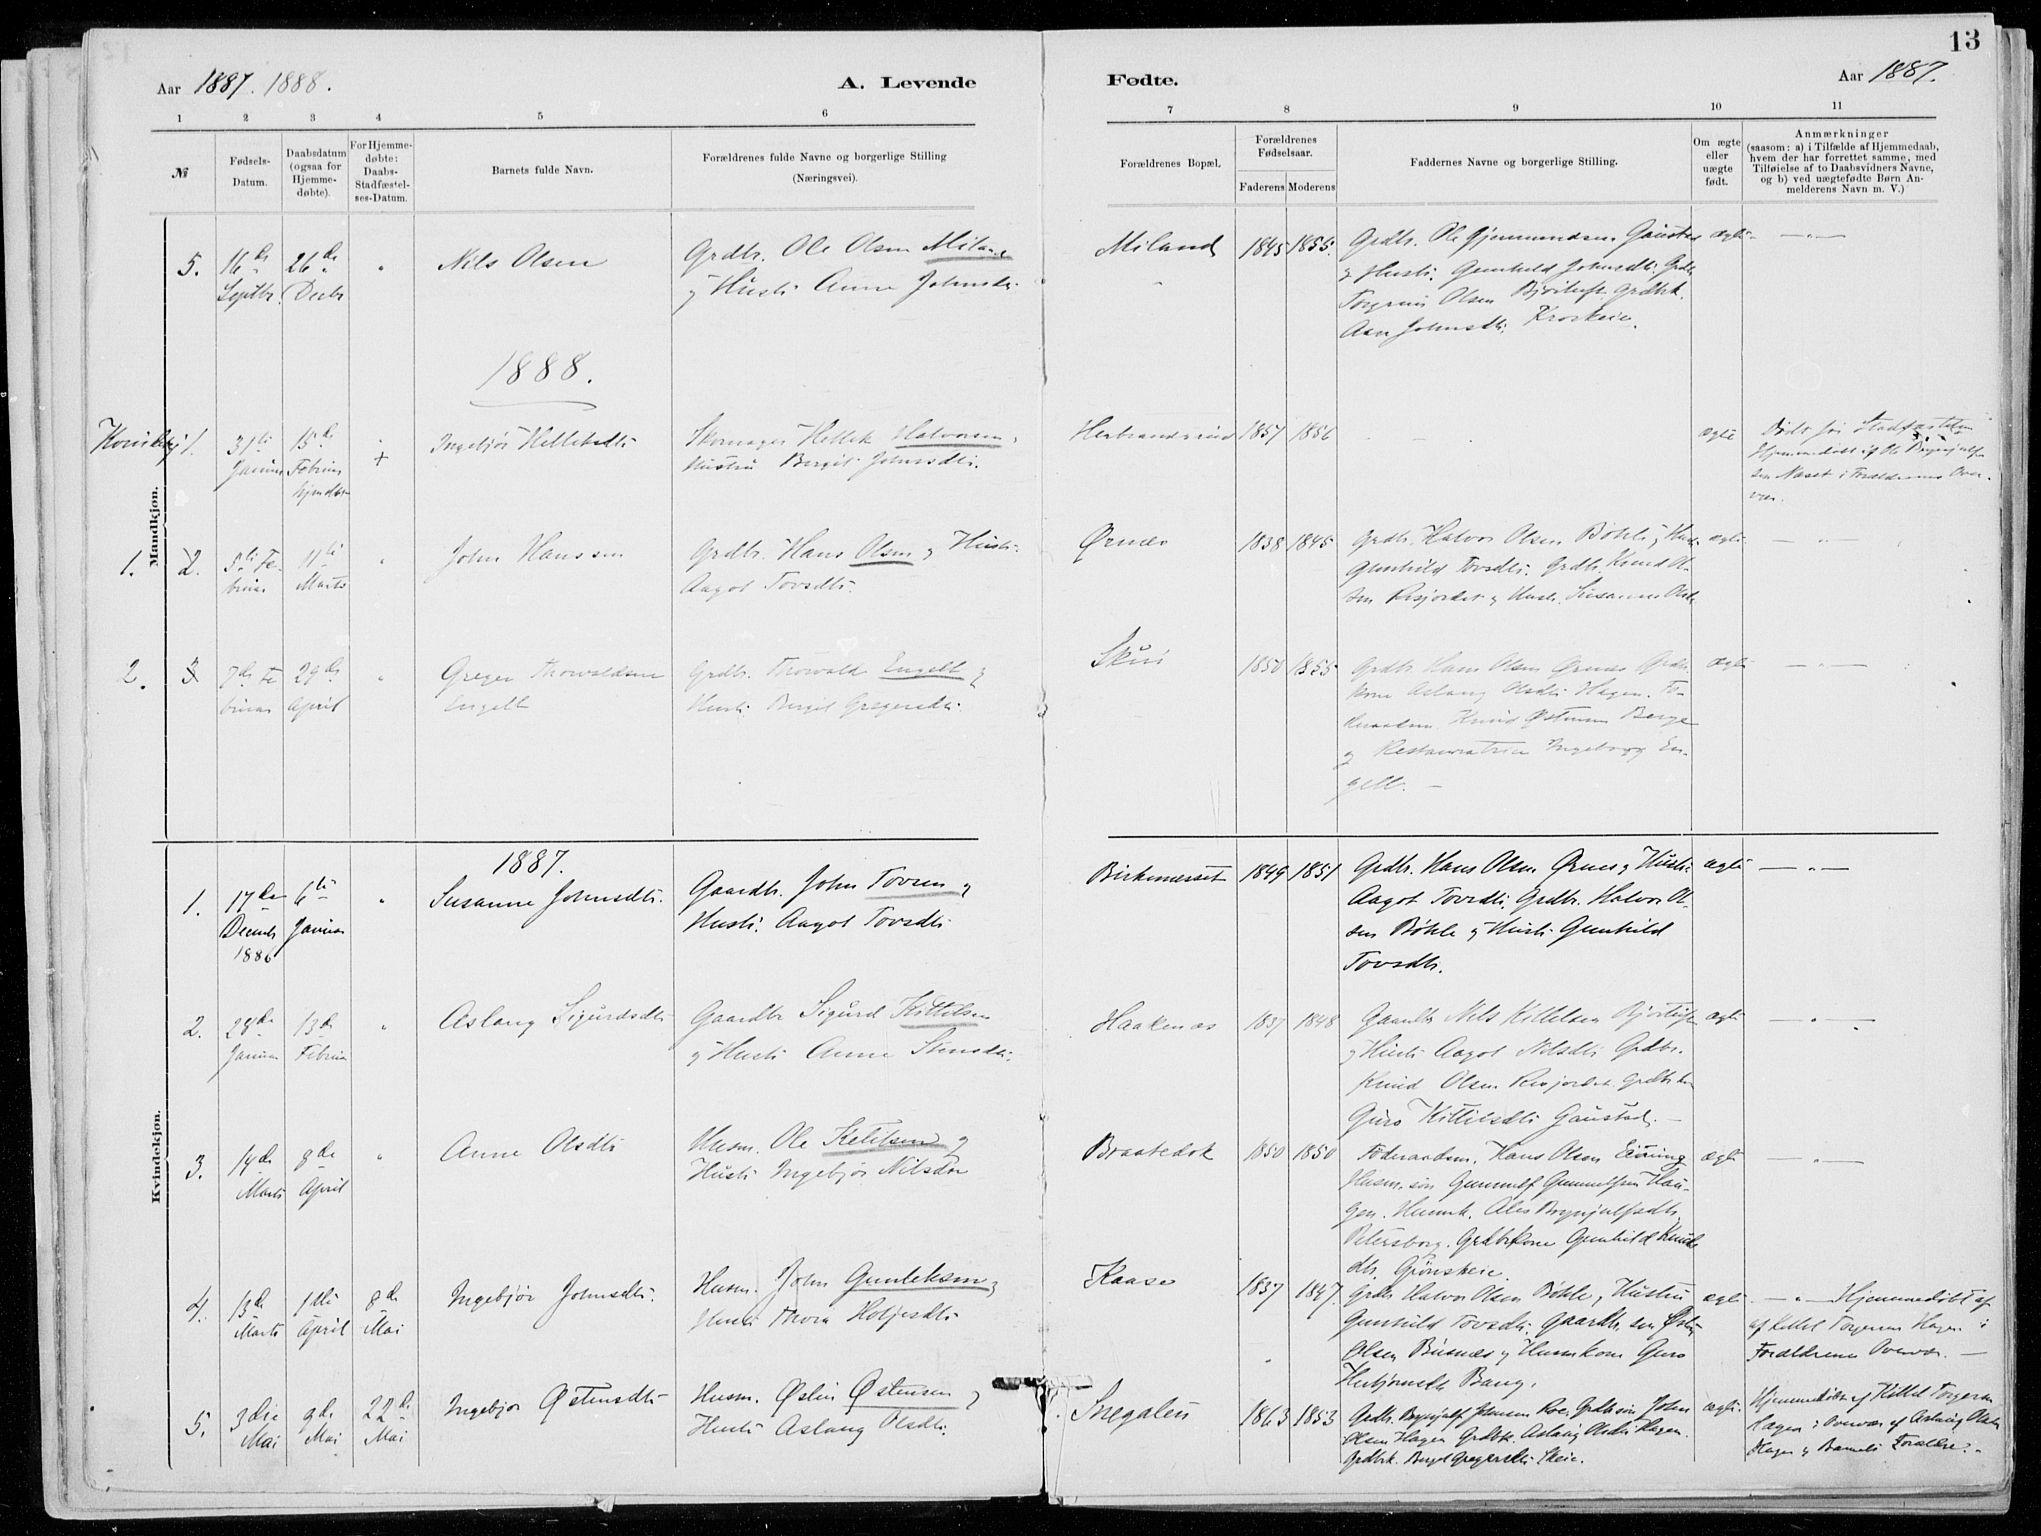 SAKO, Tinn kirkebøker, F/Fb/L0002: Ministerialbok nr. II 2, 1878-1917, s. 13